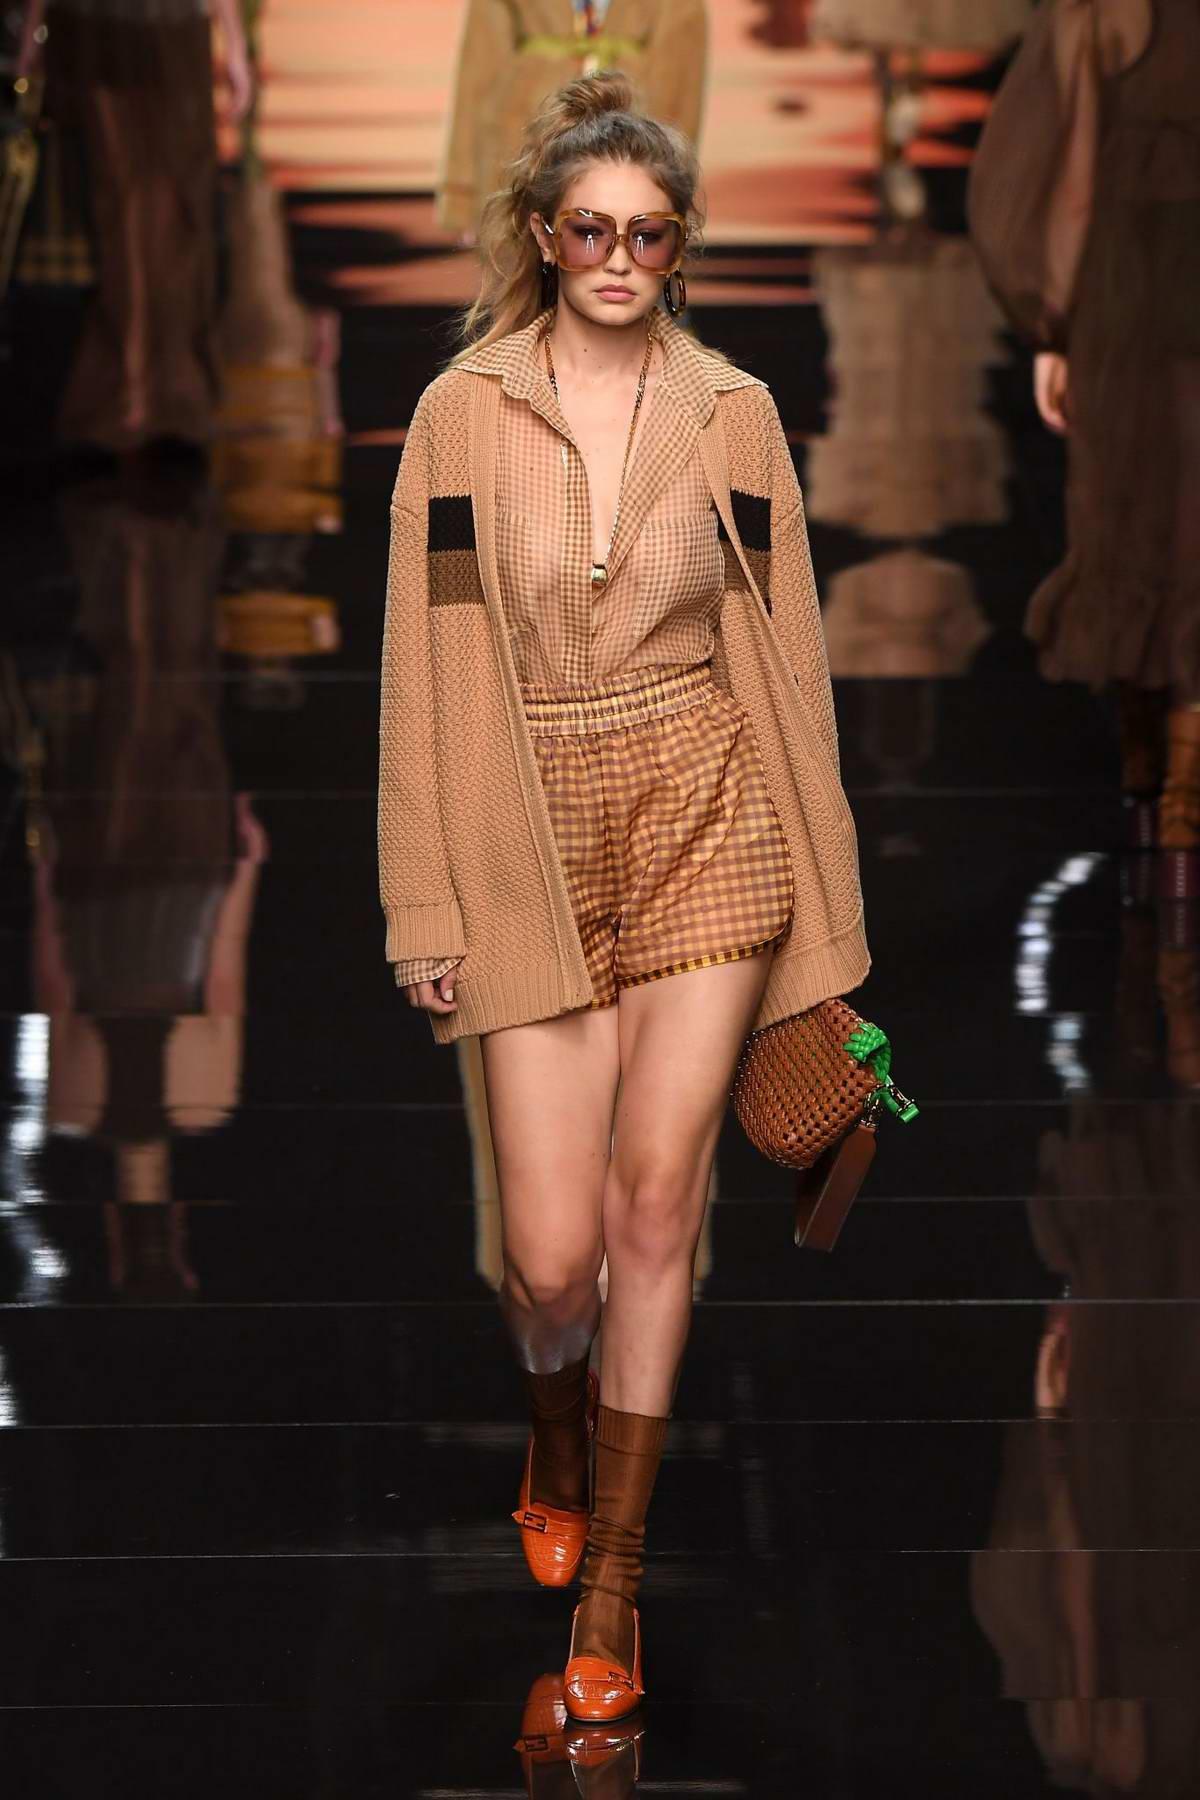 Gigi Hadid walks the runway at the Fendi show during the Milan Fashion Week, Spring/Summer 2020 in Milan, Italy